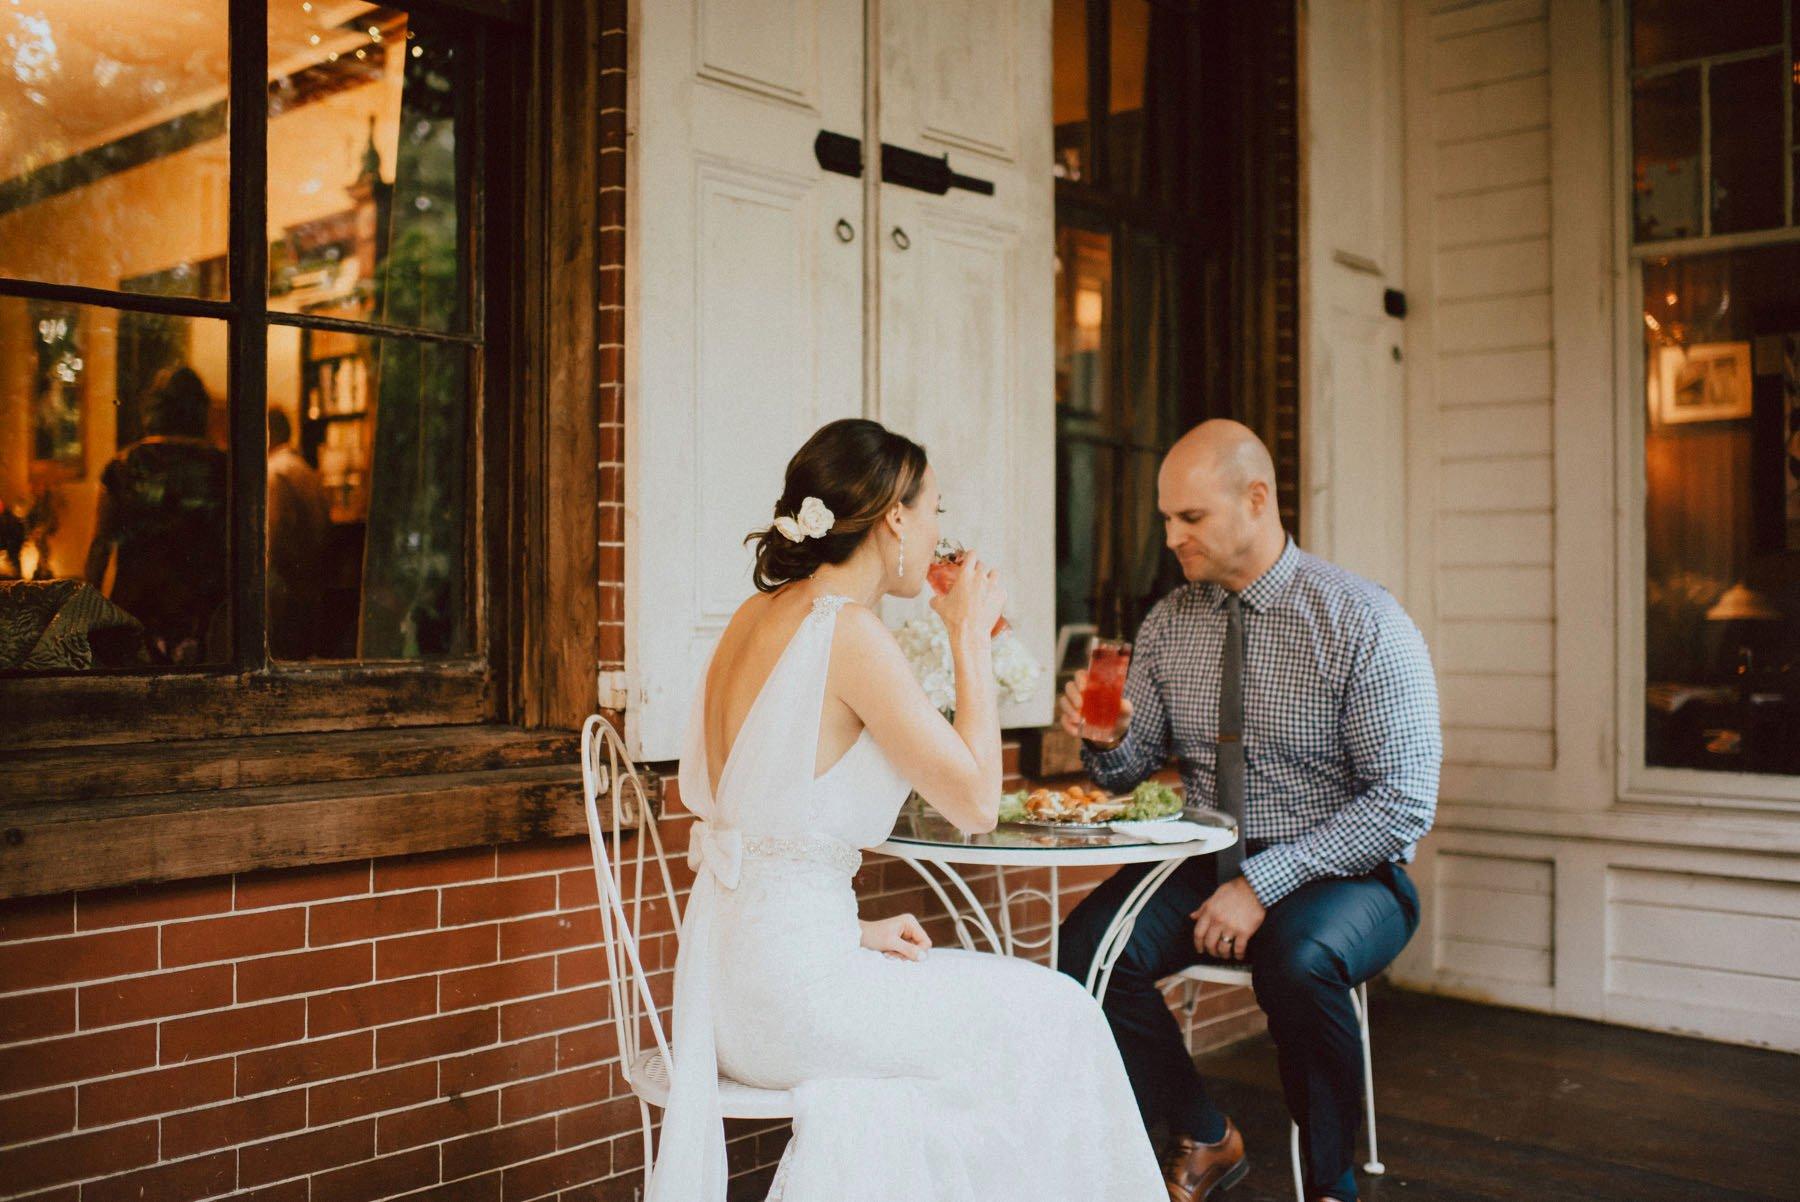 faunbrook-bed-and-breakfast-wedding-92.jpg